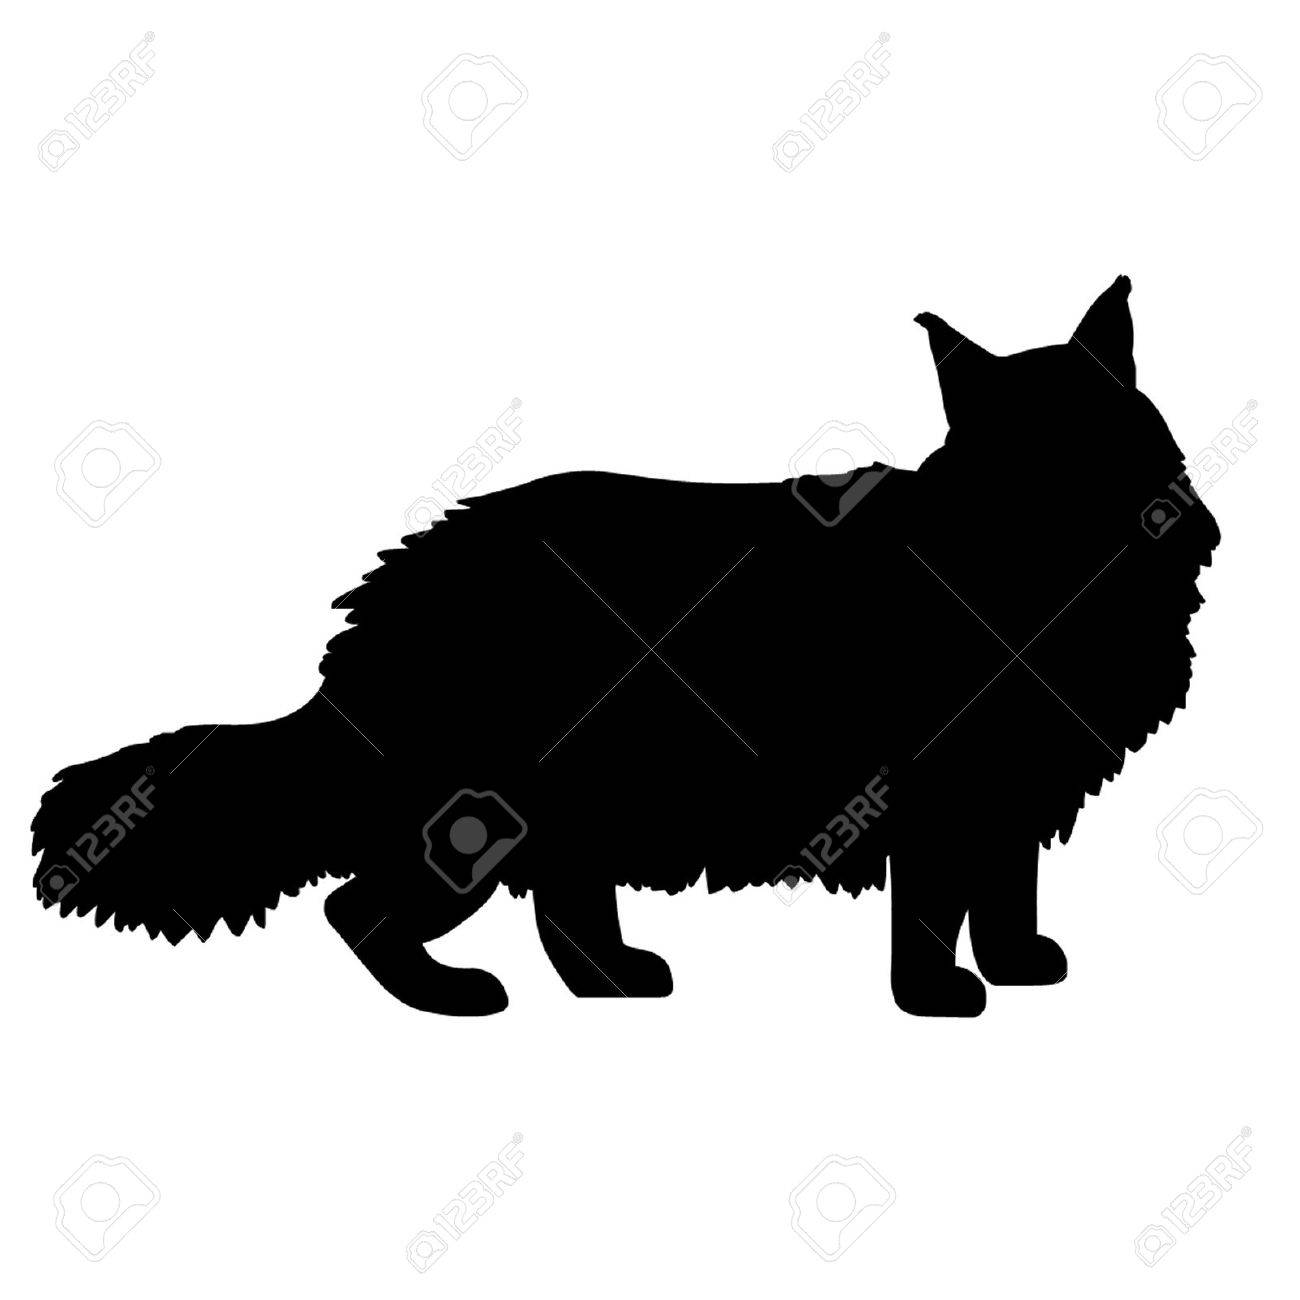 Maine Coon Cat Stock Vector - 16383894